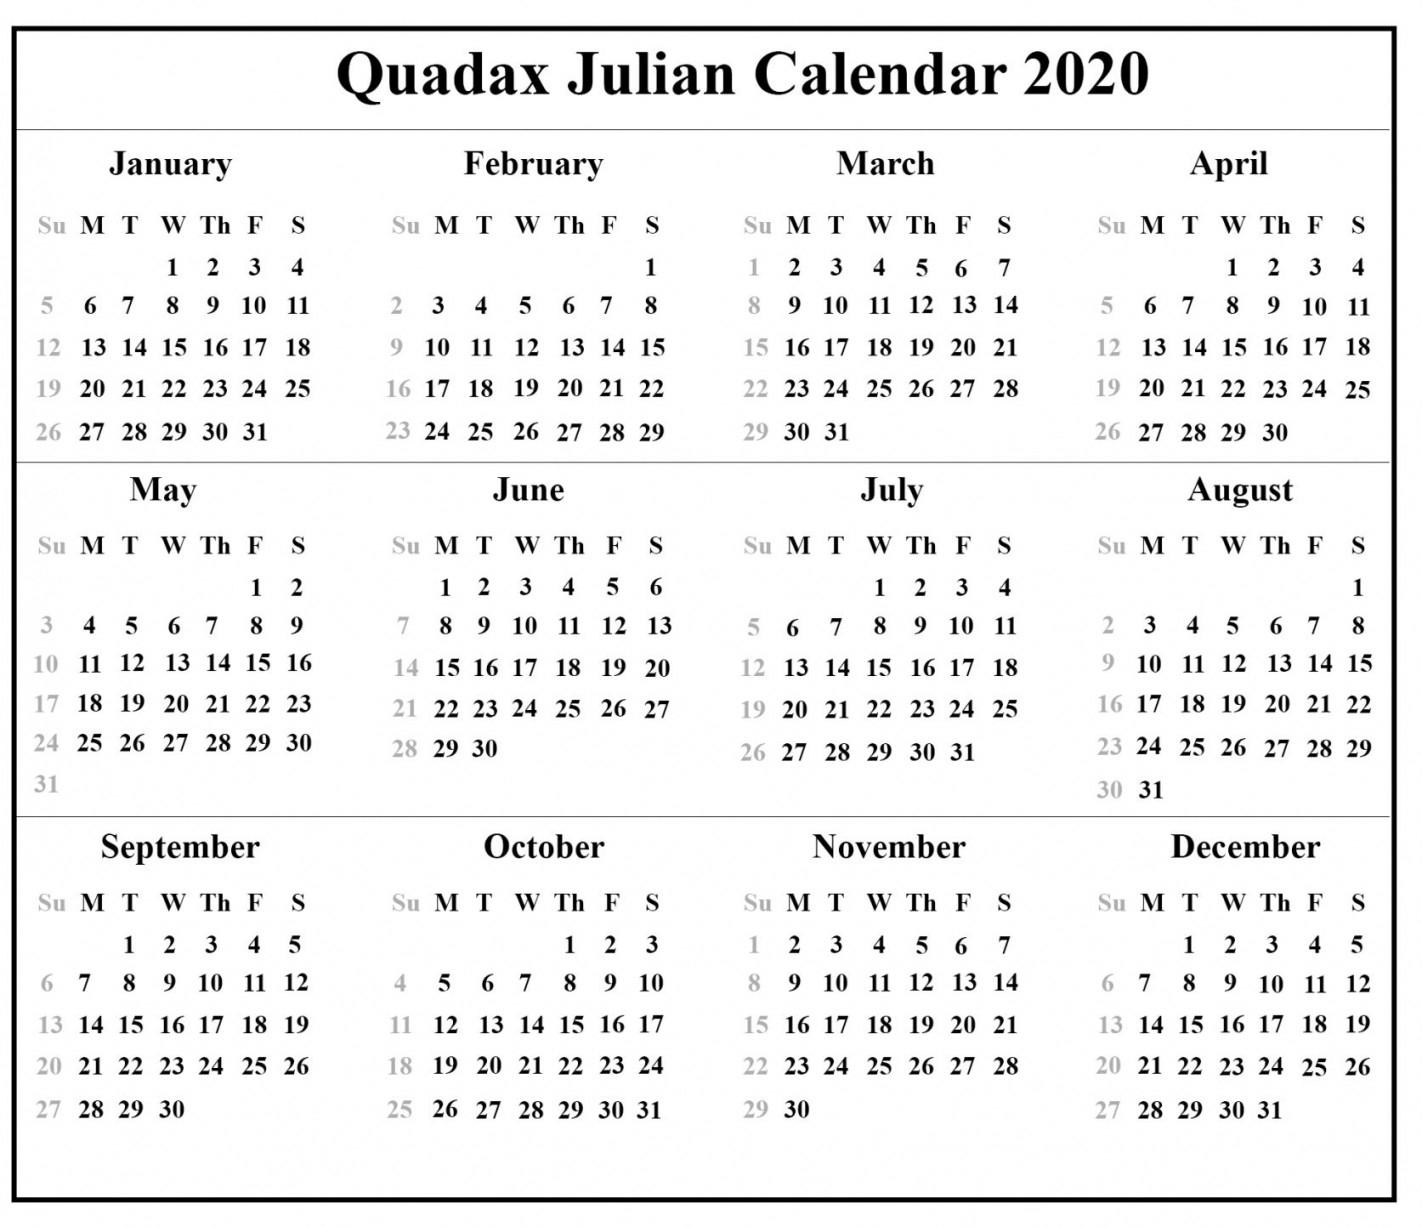 Free Printable 2021 Calendar With Julian Dates | Printable  2021 Printable Julian Date Calendar